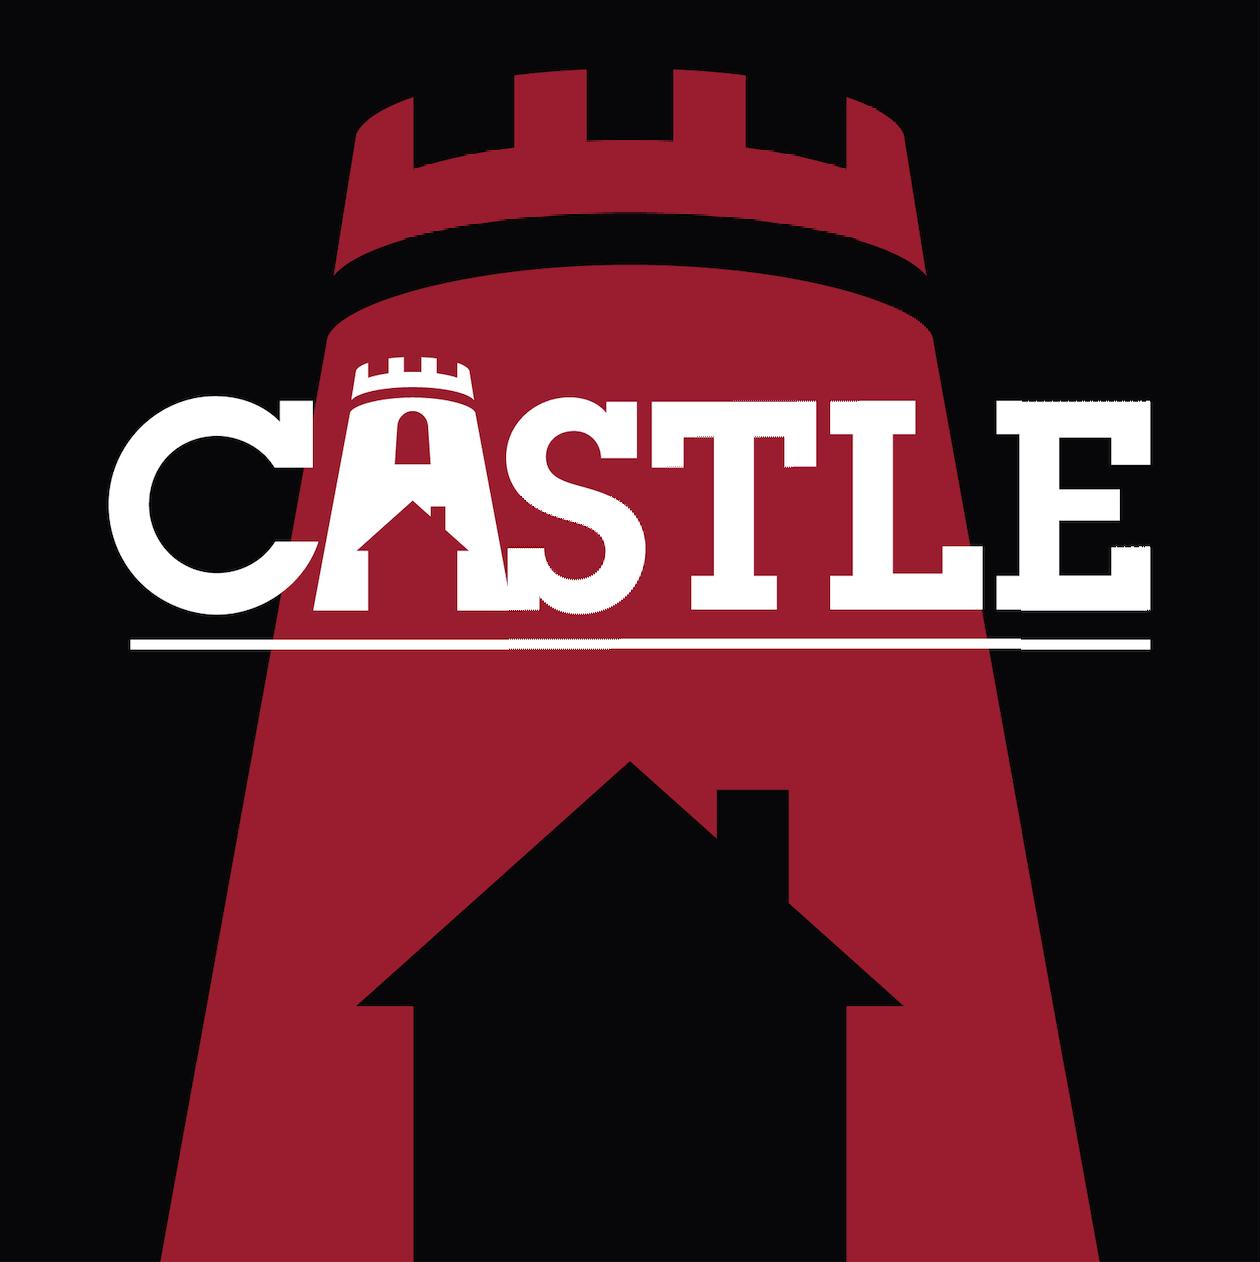 Castle Realty, LLC logo